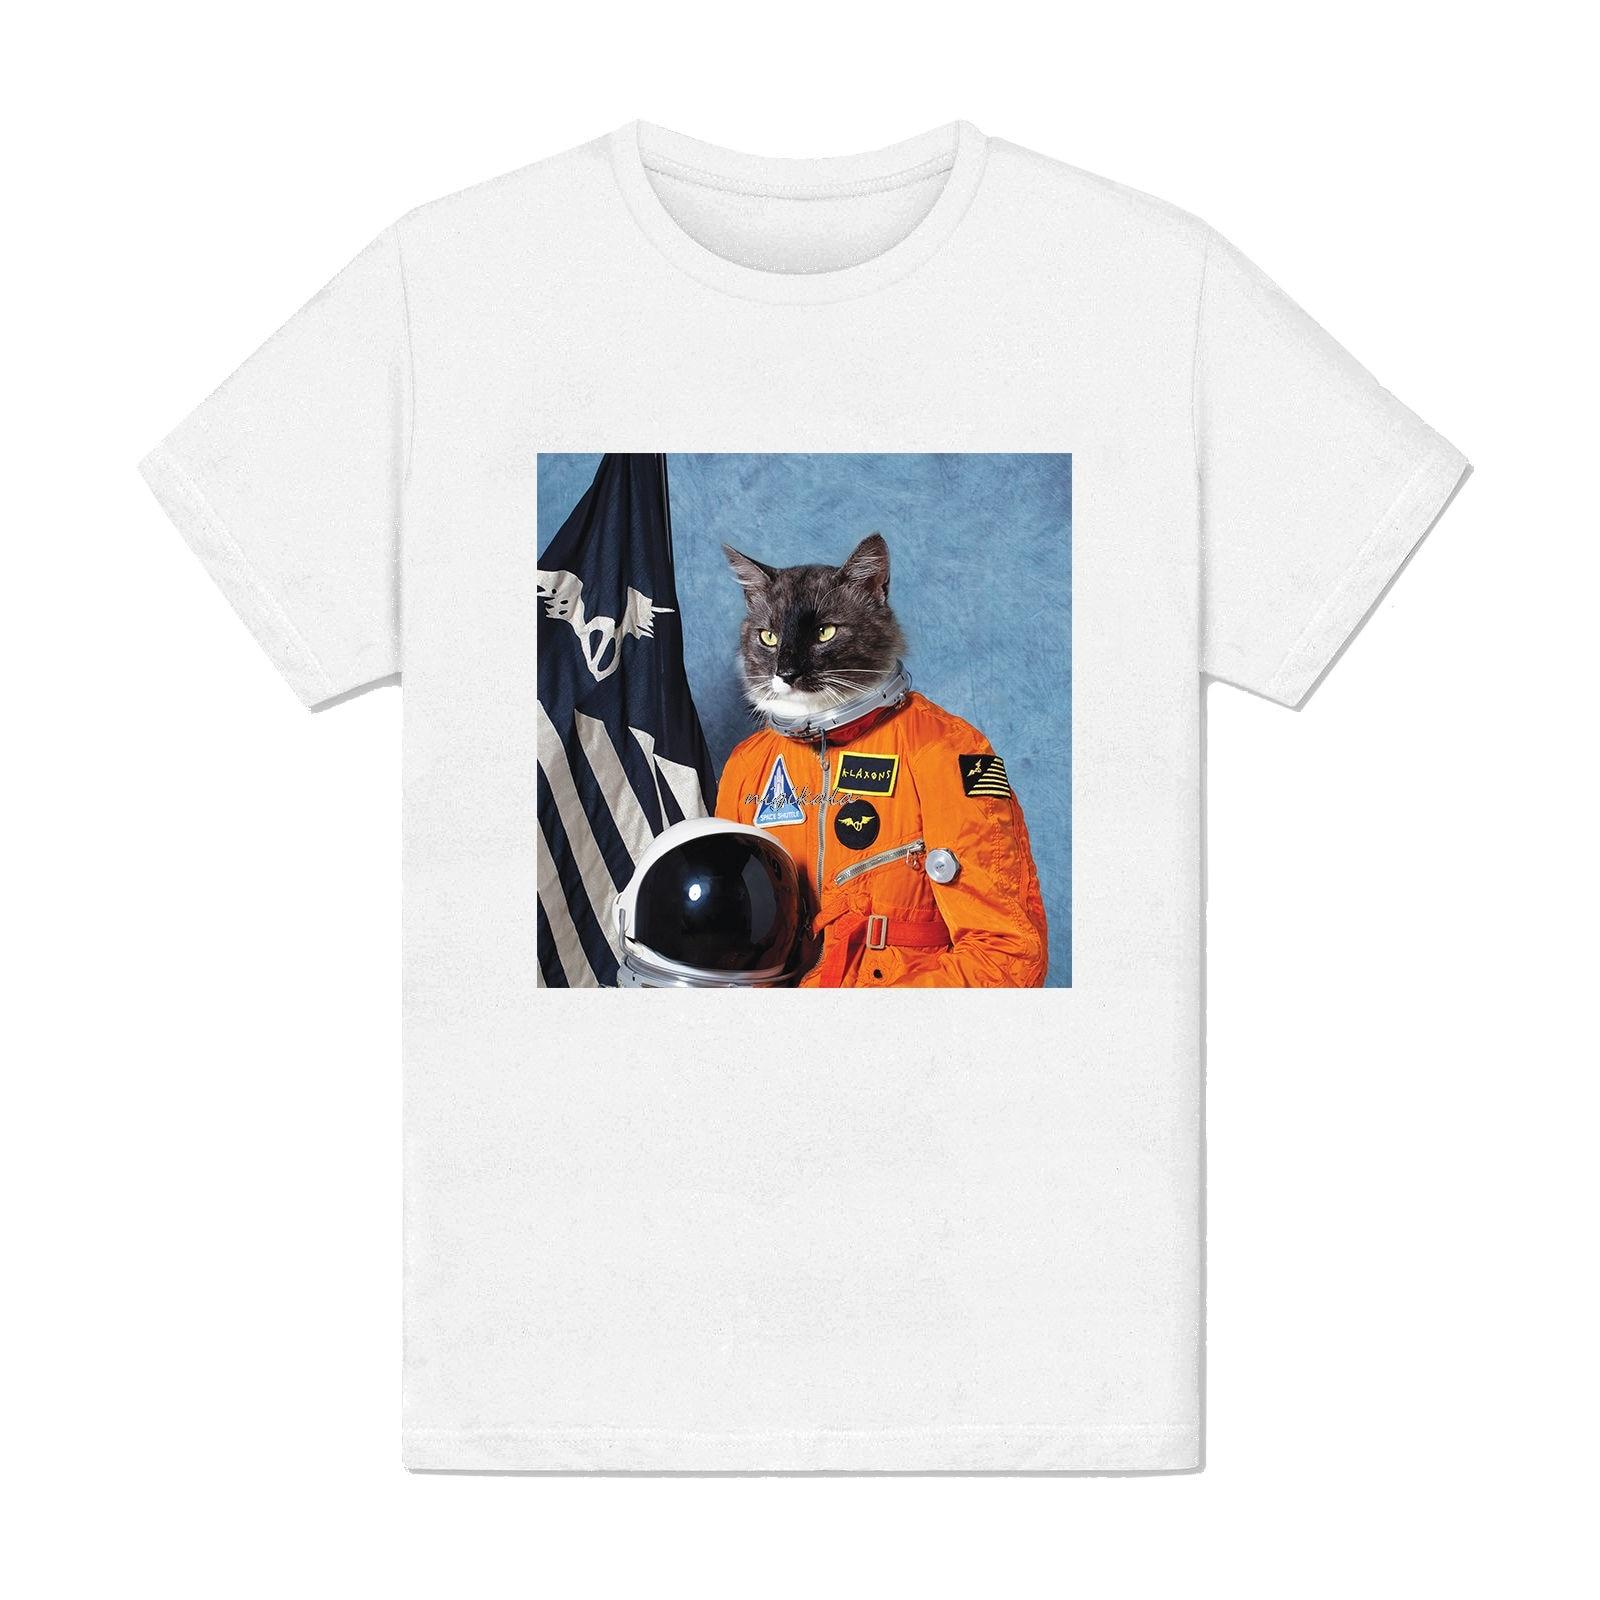 Camiseta Homme - Chat Espace Amant Astronaute Amerique a-mode Francia nueva moda para hombres Camiseta de manga corta para hombre